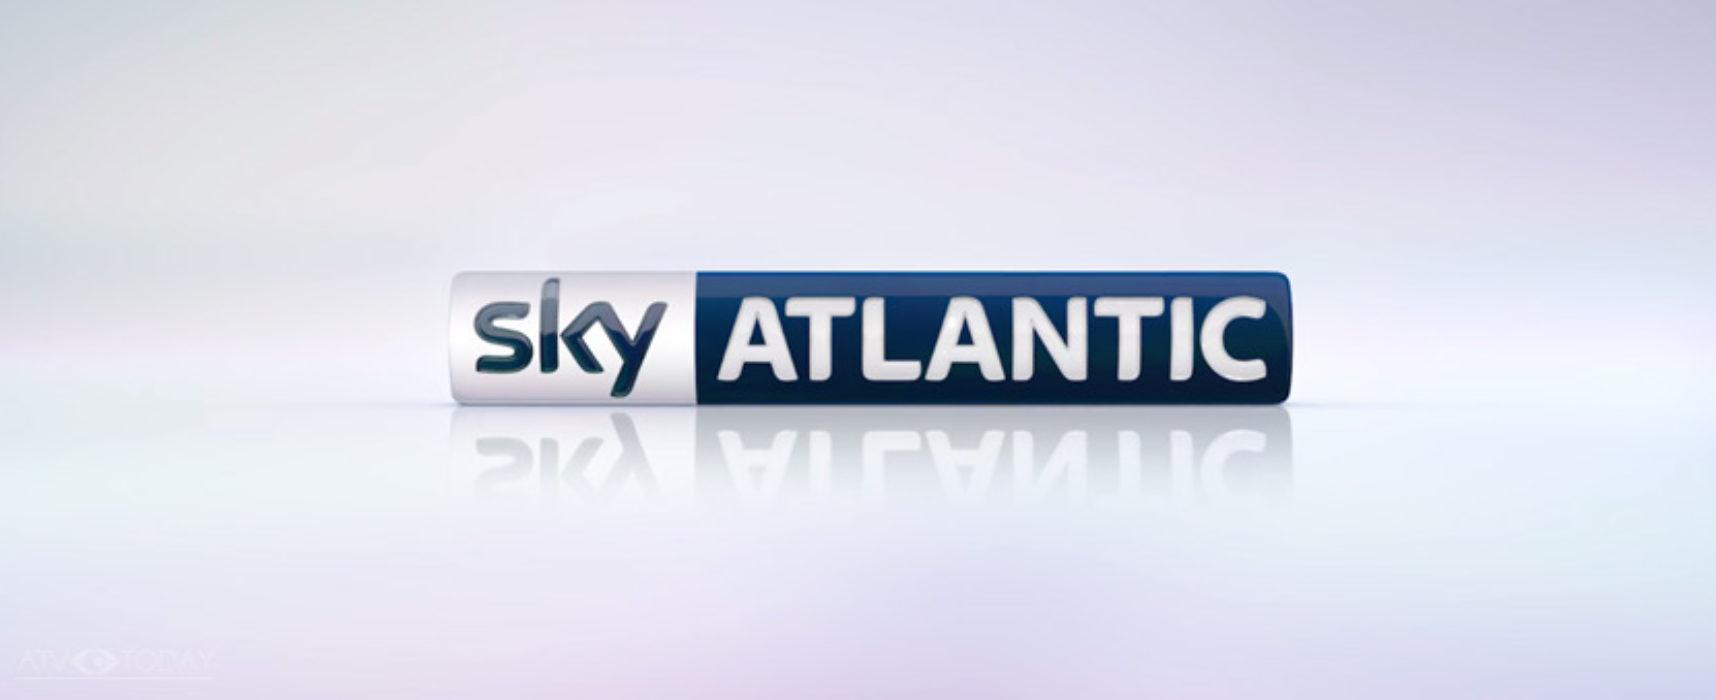 John Ridley's Guerrilla to air on Sky Atlantic